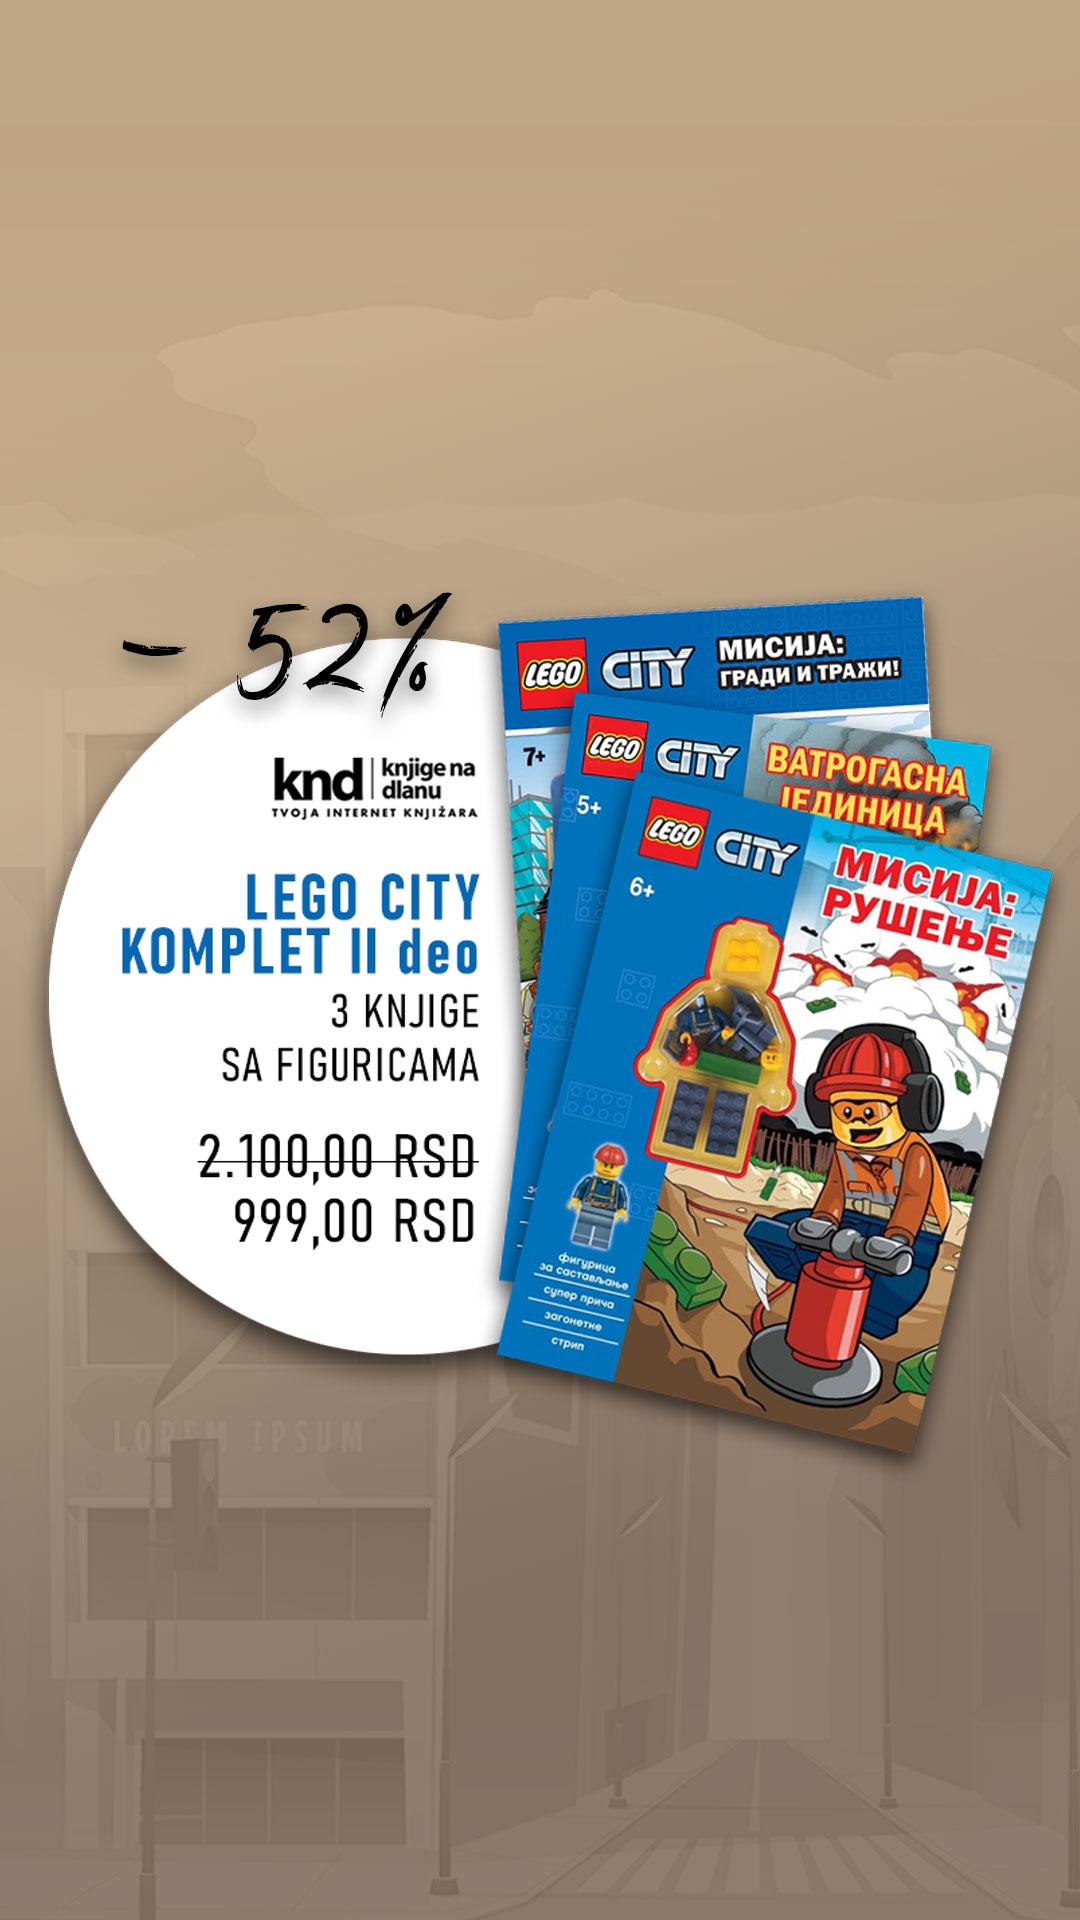 LEGO CITY KOMPLET II deo – 3 KNJIGE SA FIGURICAMA ZA 999